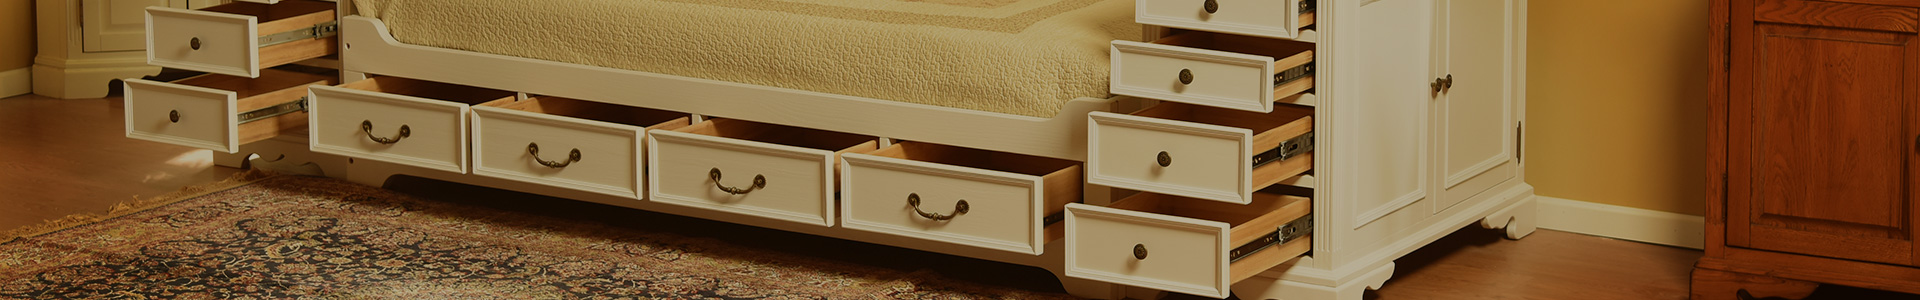 news-Furniture Handle- Furniture Knobs- furniture pulls-Hoone-img